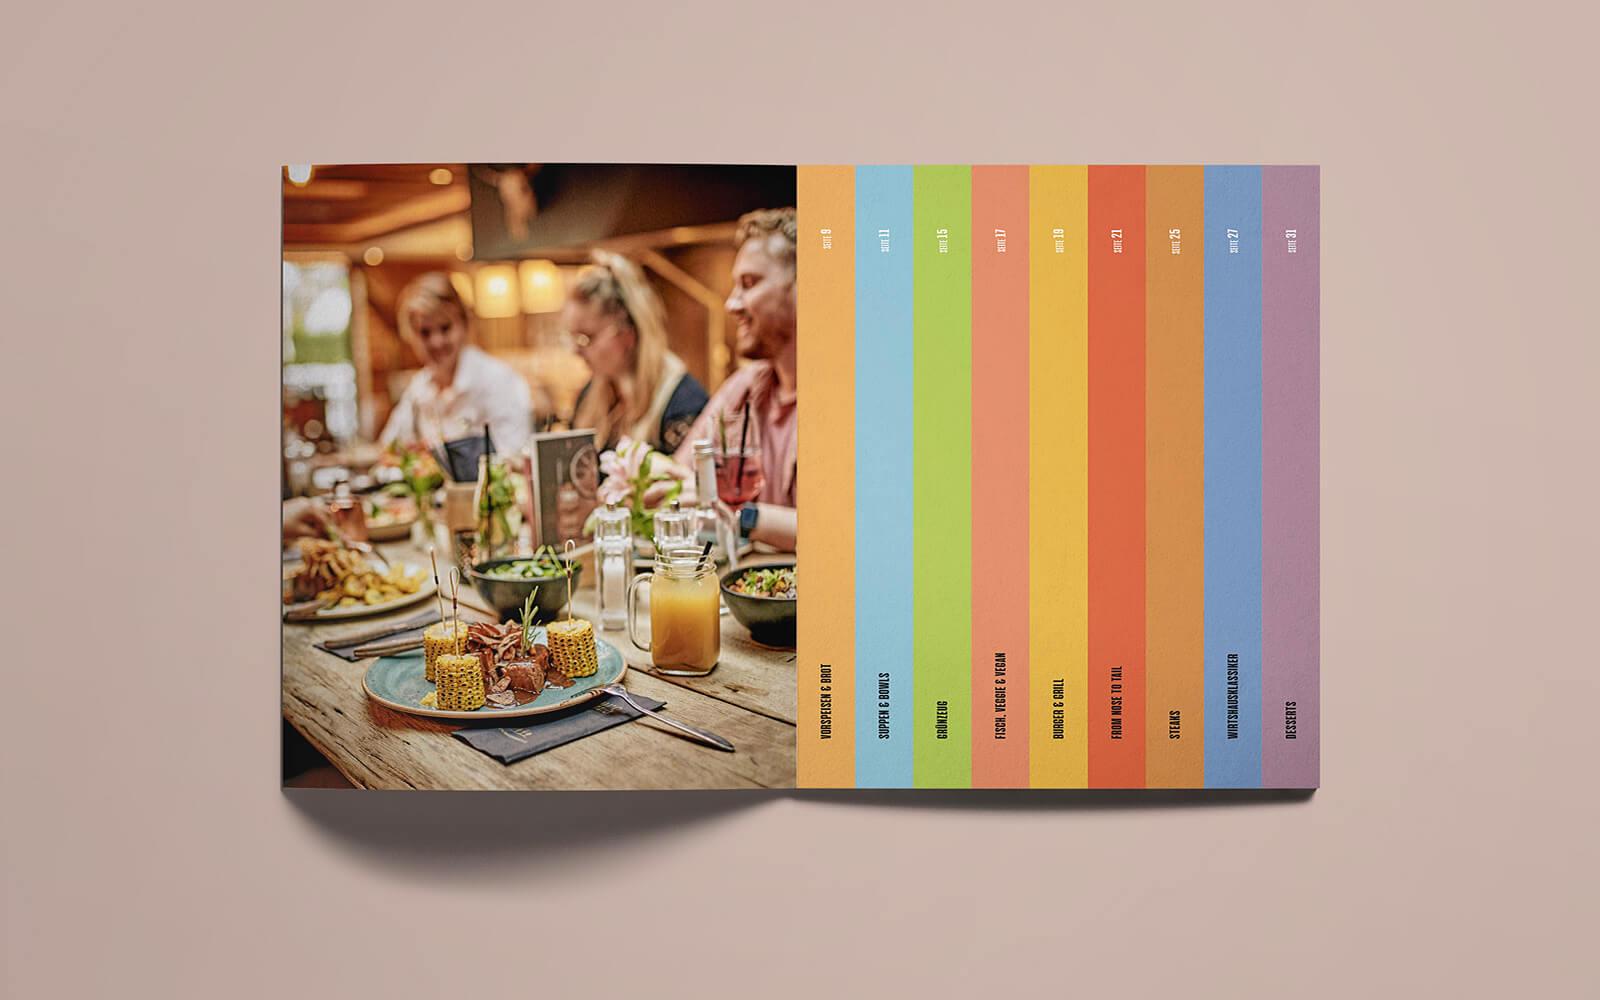 TONI's Speisekarte – Inhaltsverzeichnis